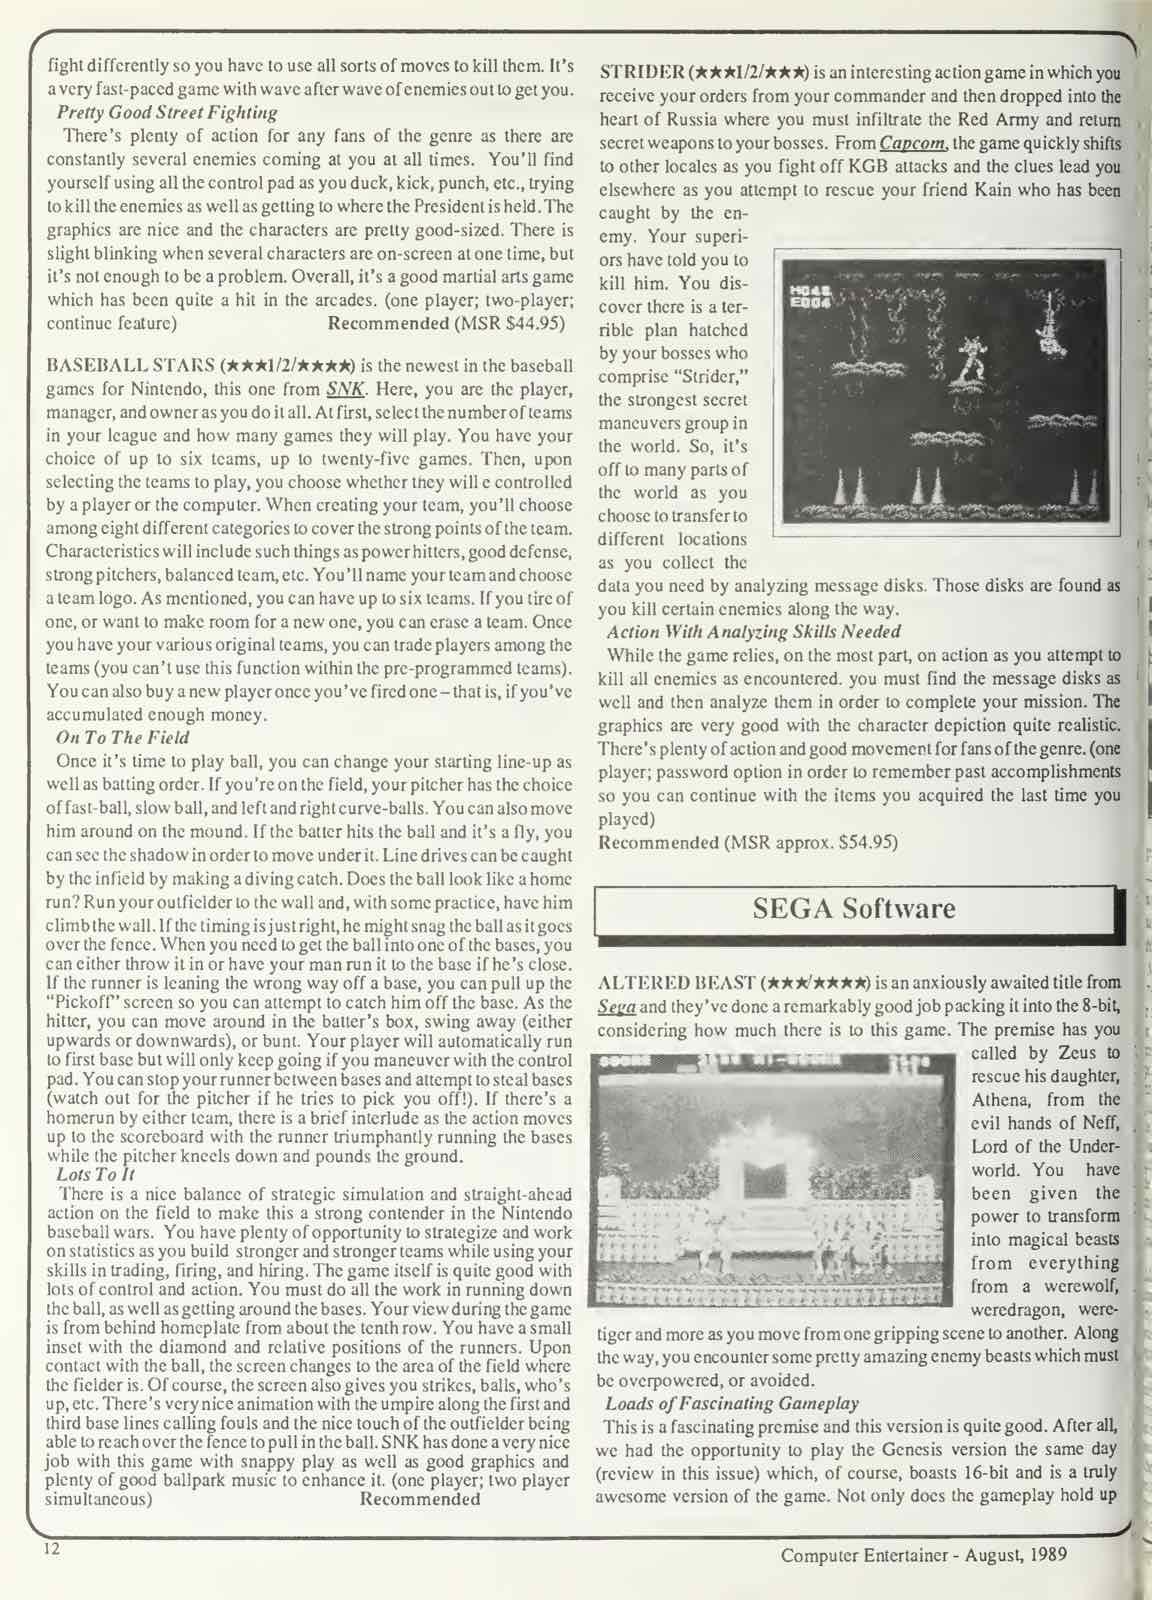 Computer Entertainer | August 1989 p12